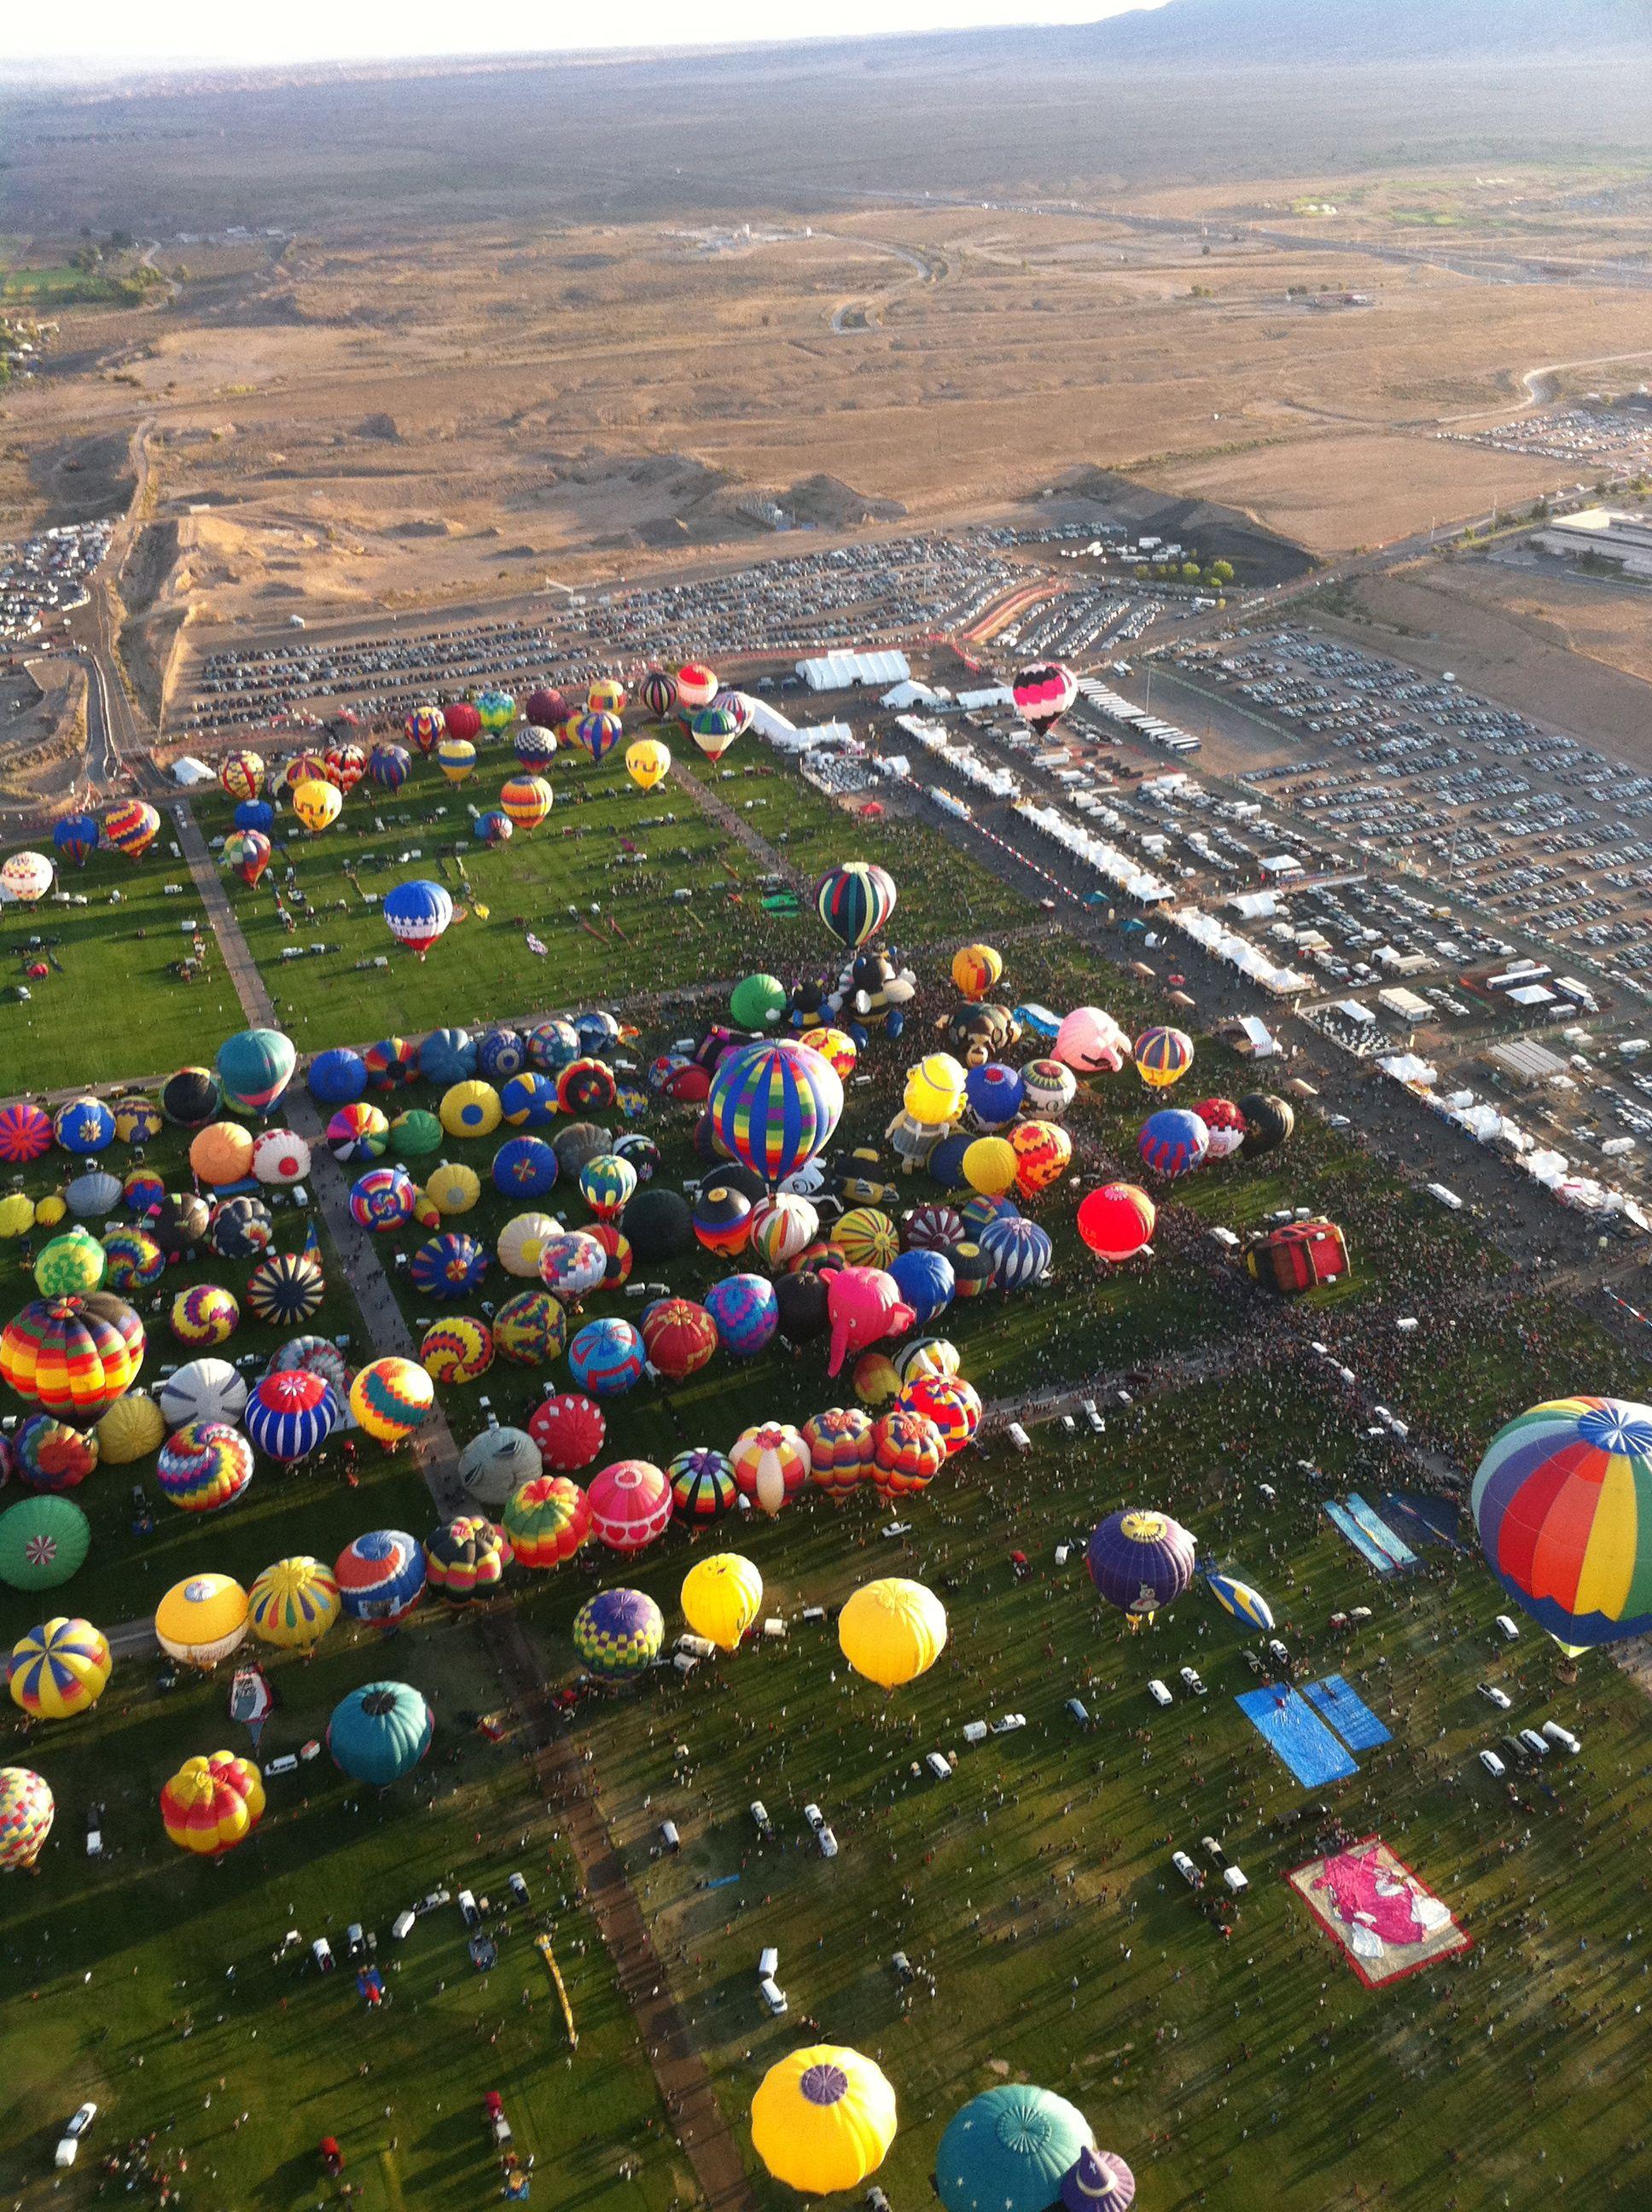 Airborne in mass ascension ABQ 2011 Hot air balloon